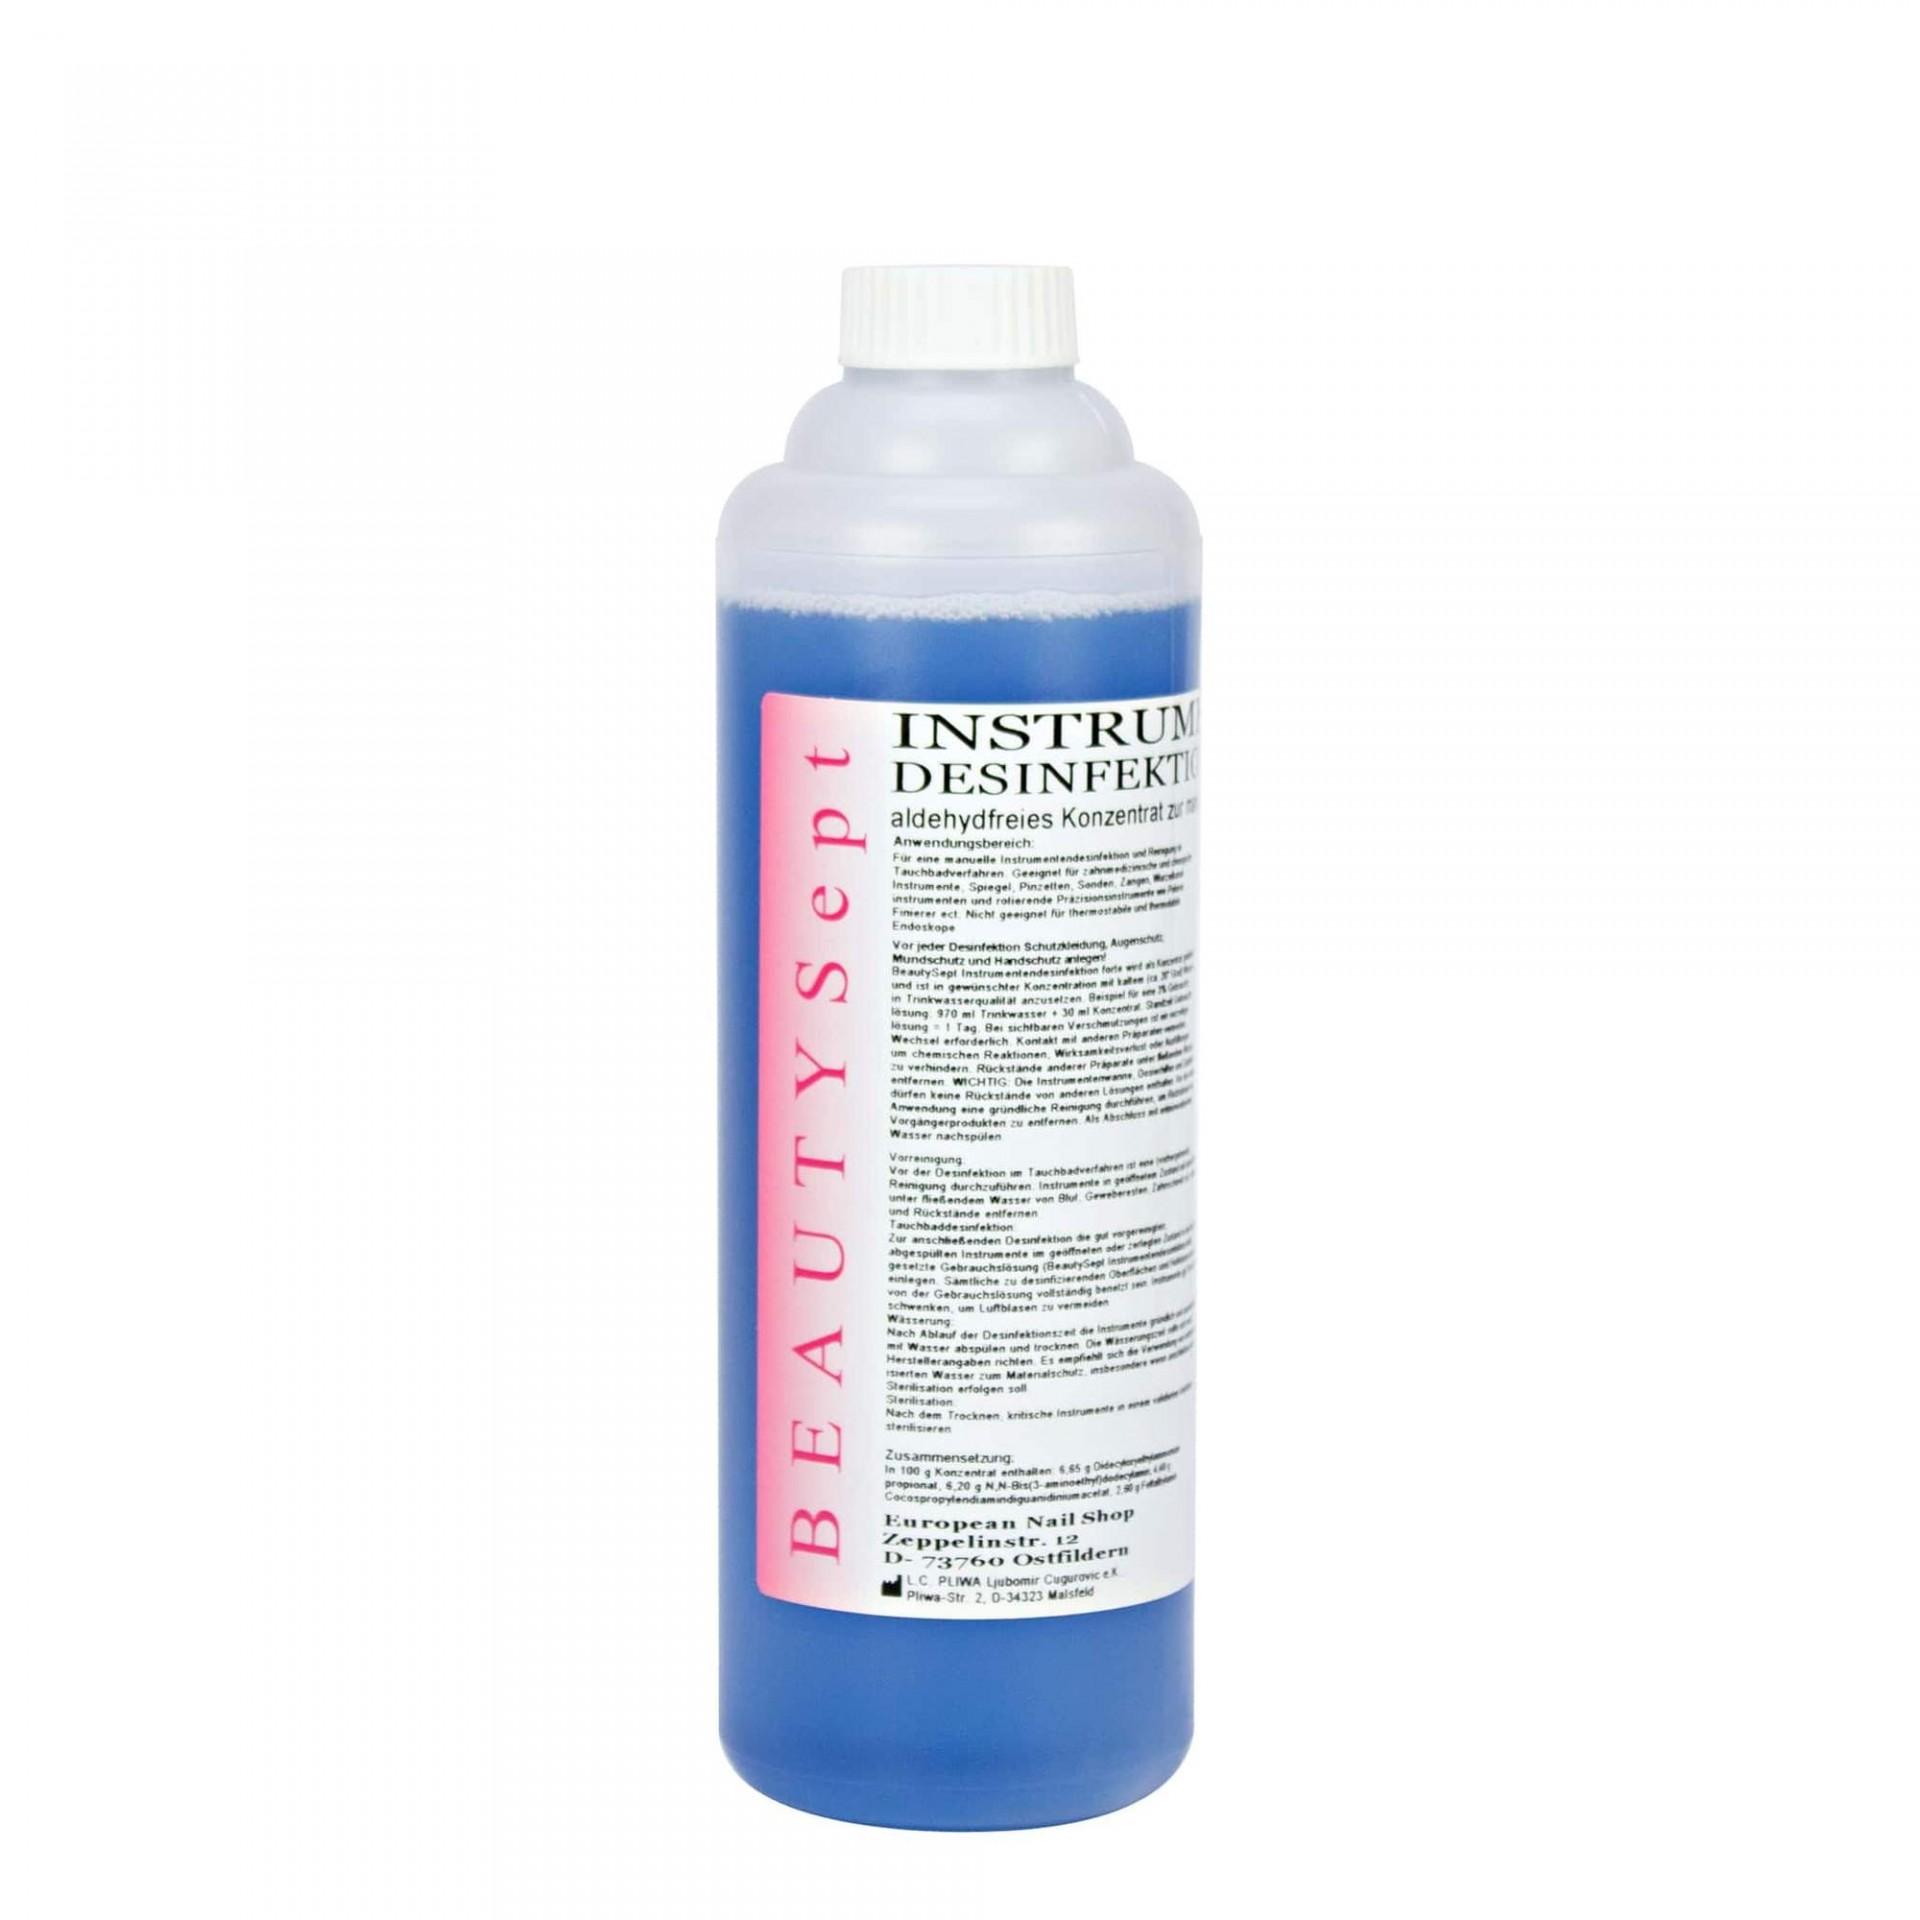 Desinfectante Forte para utensílios